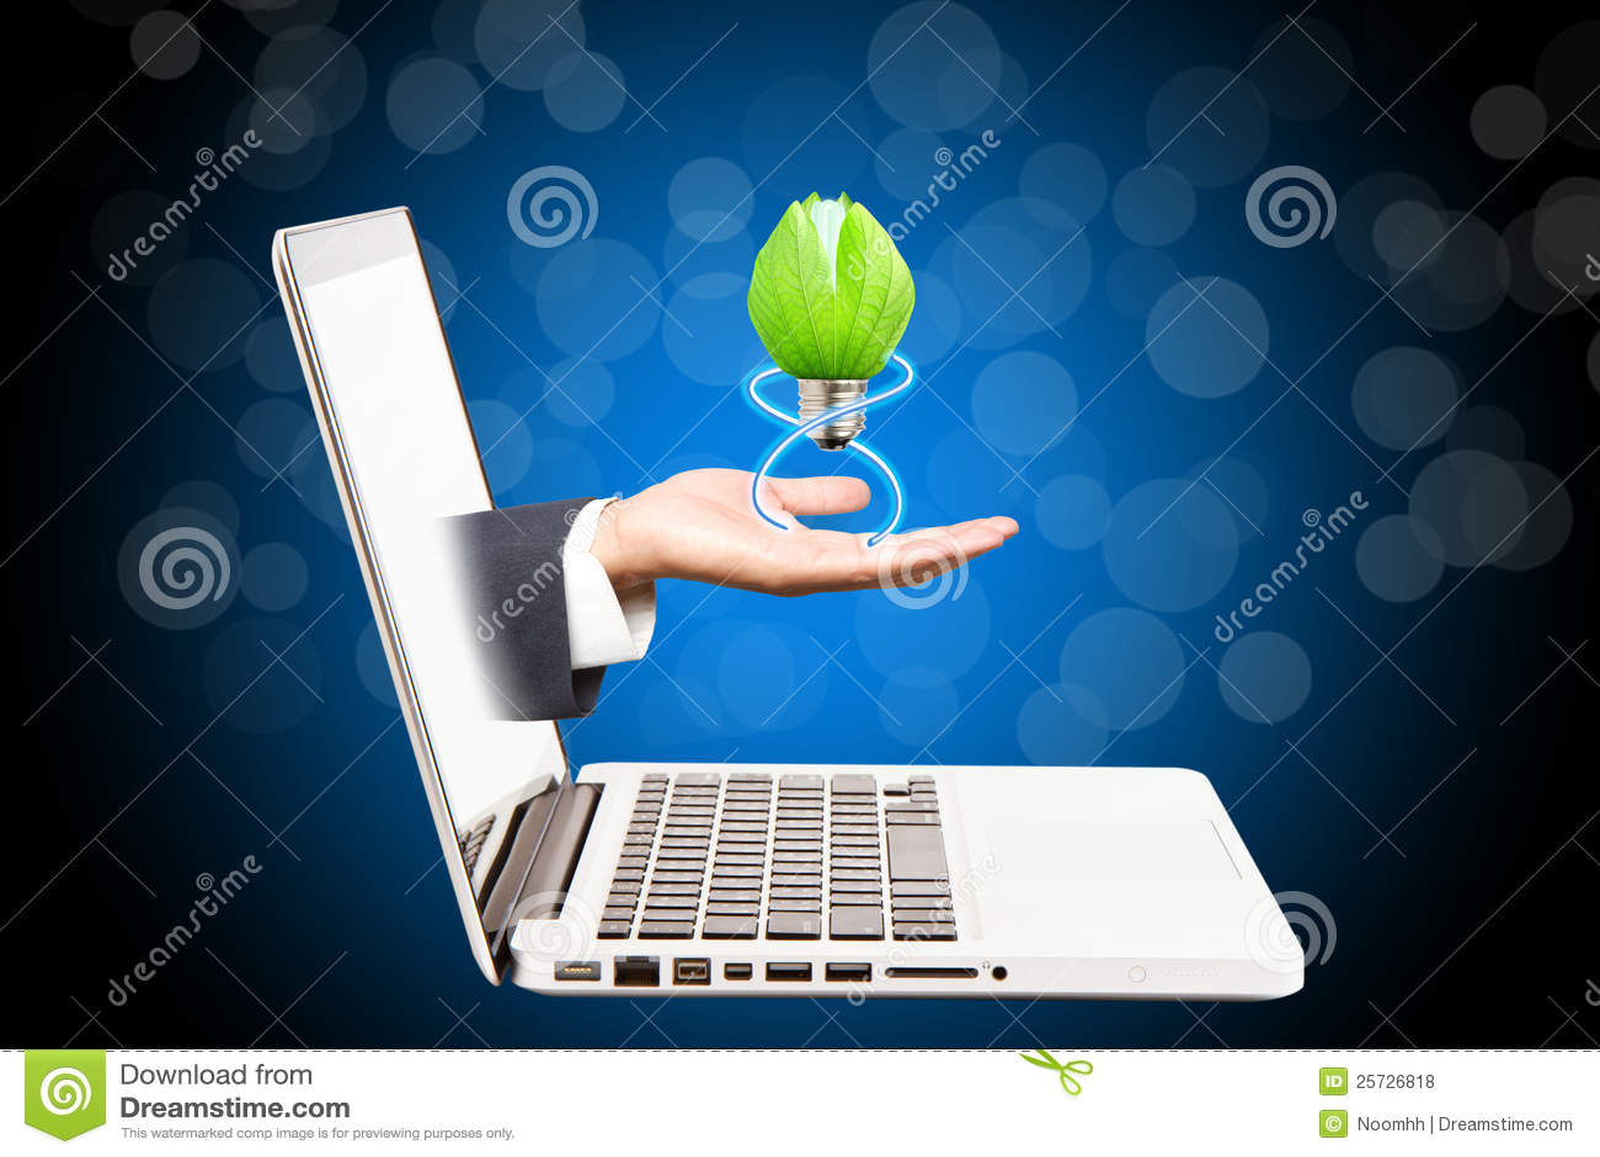 Green lamp on hand